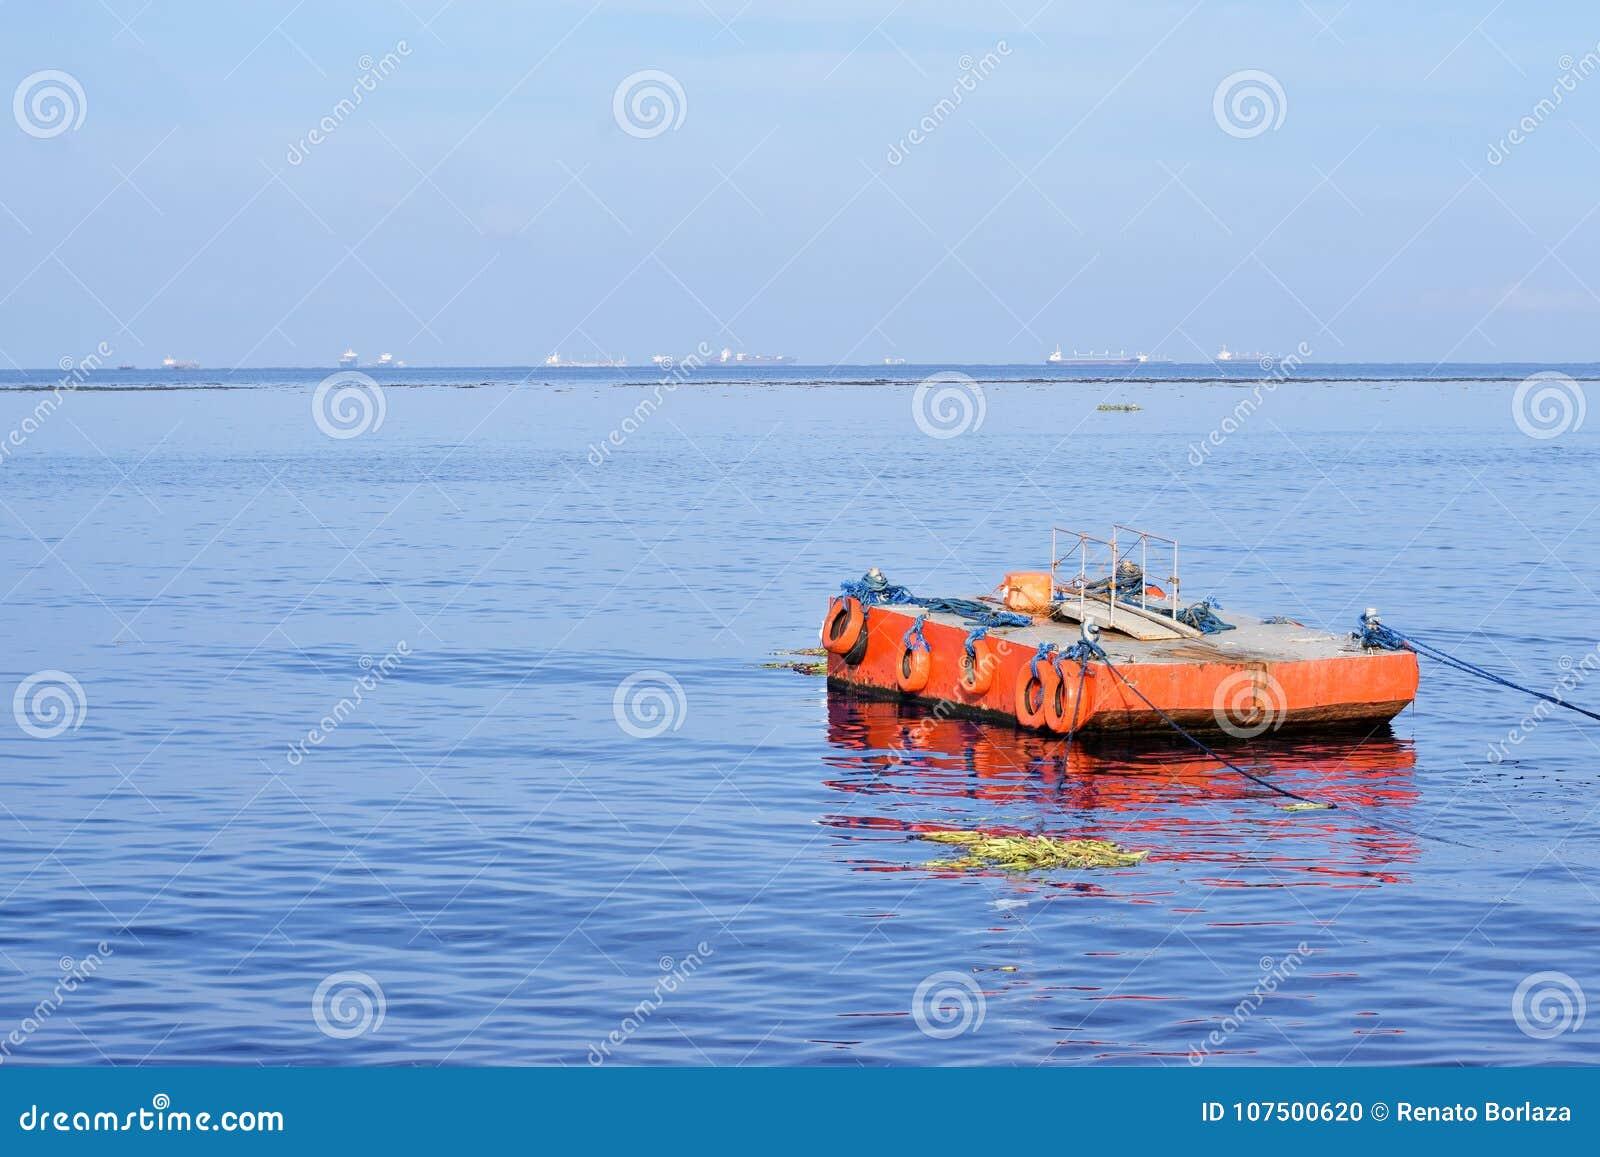 Orange malte Metalllastkahn verankert entlang Ozeanbucht